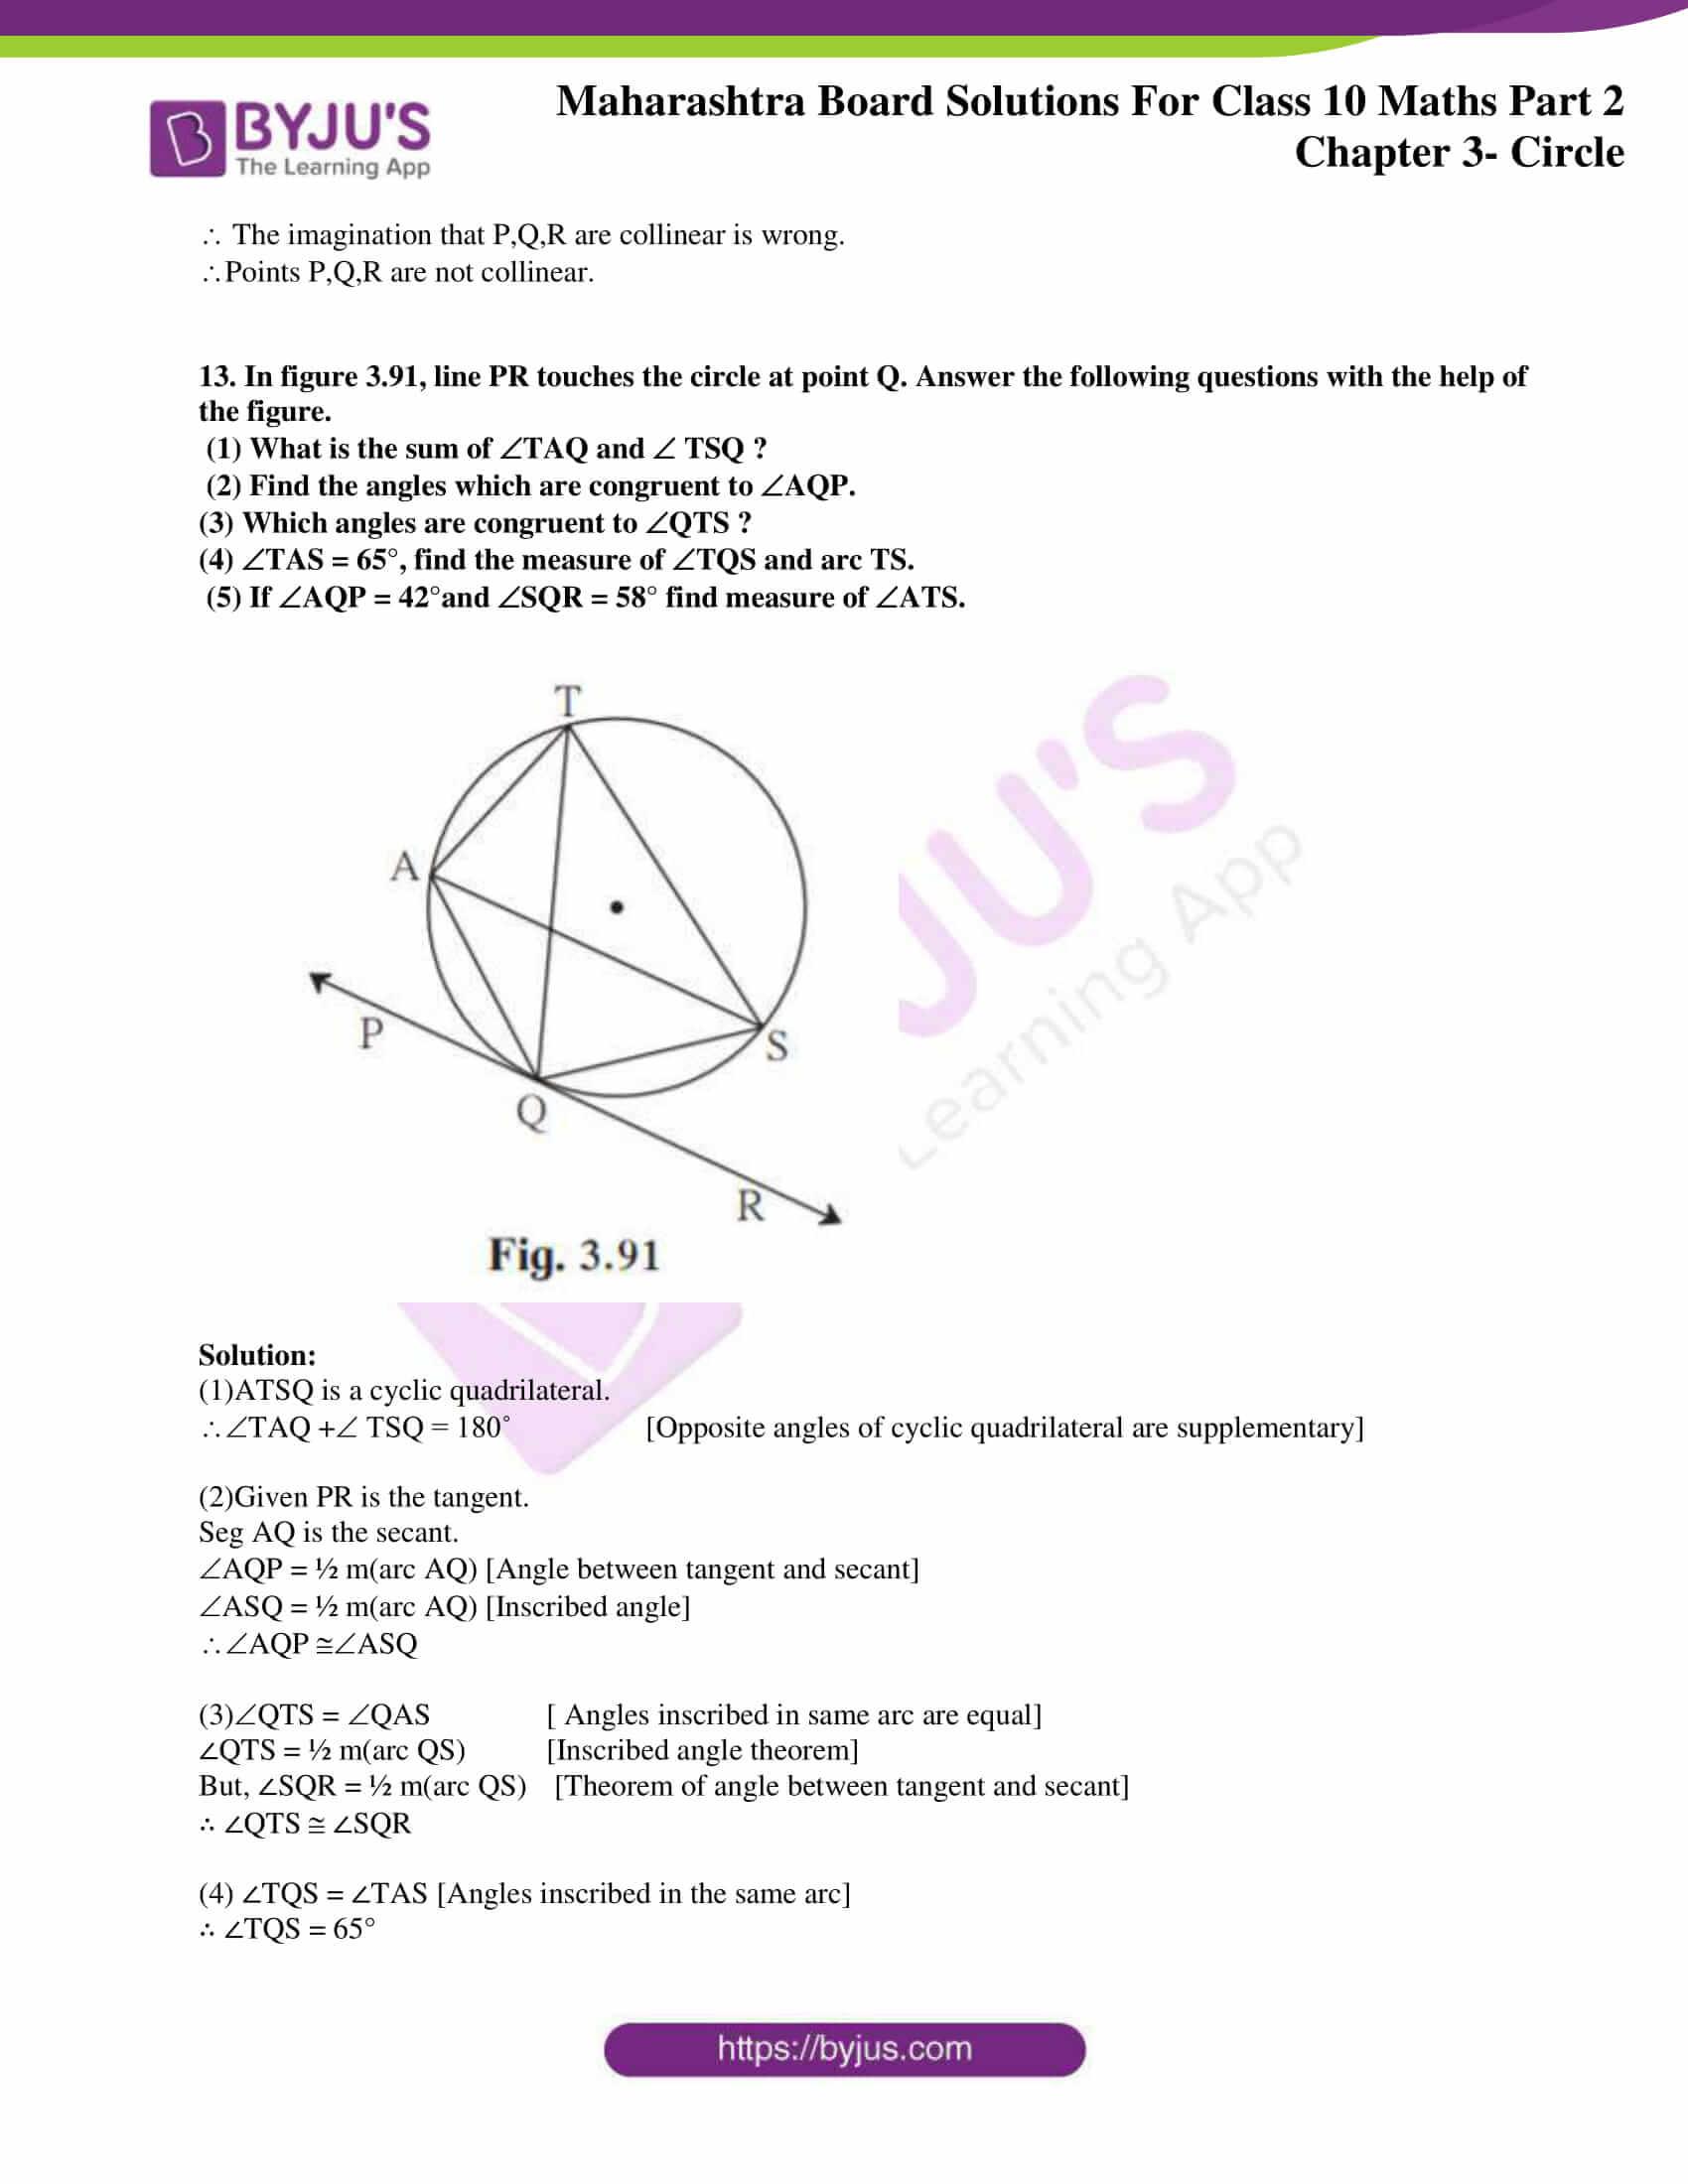 msbshse sol class 10 maths part 2 chapter 3 33